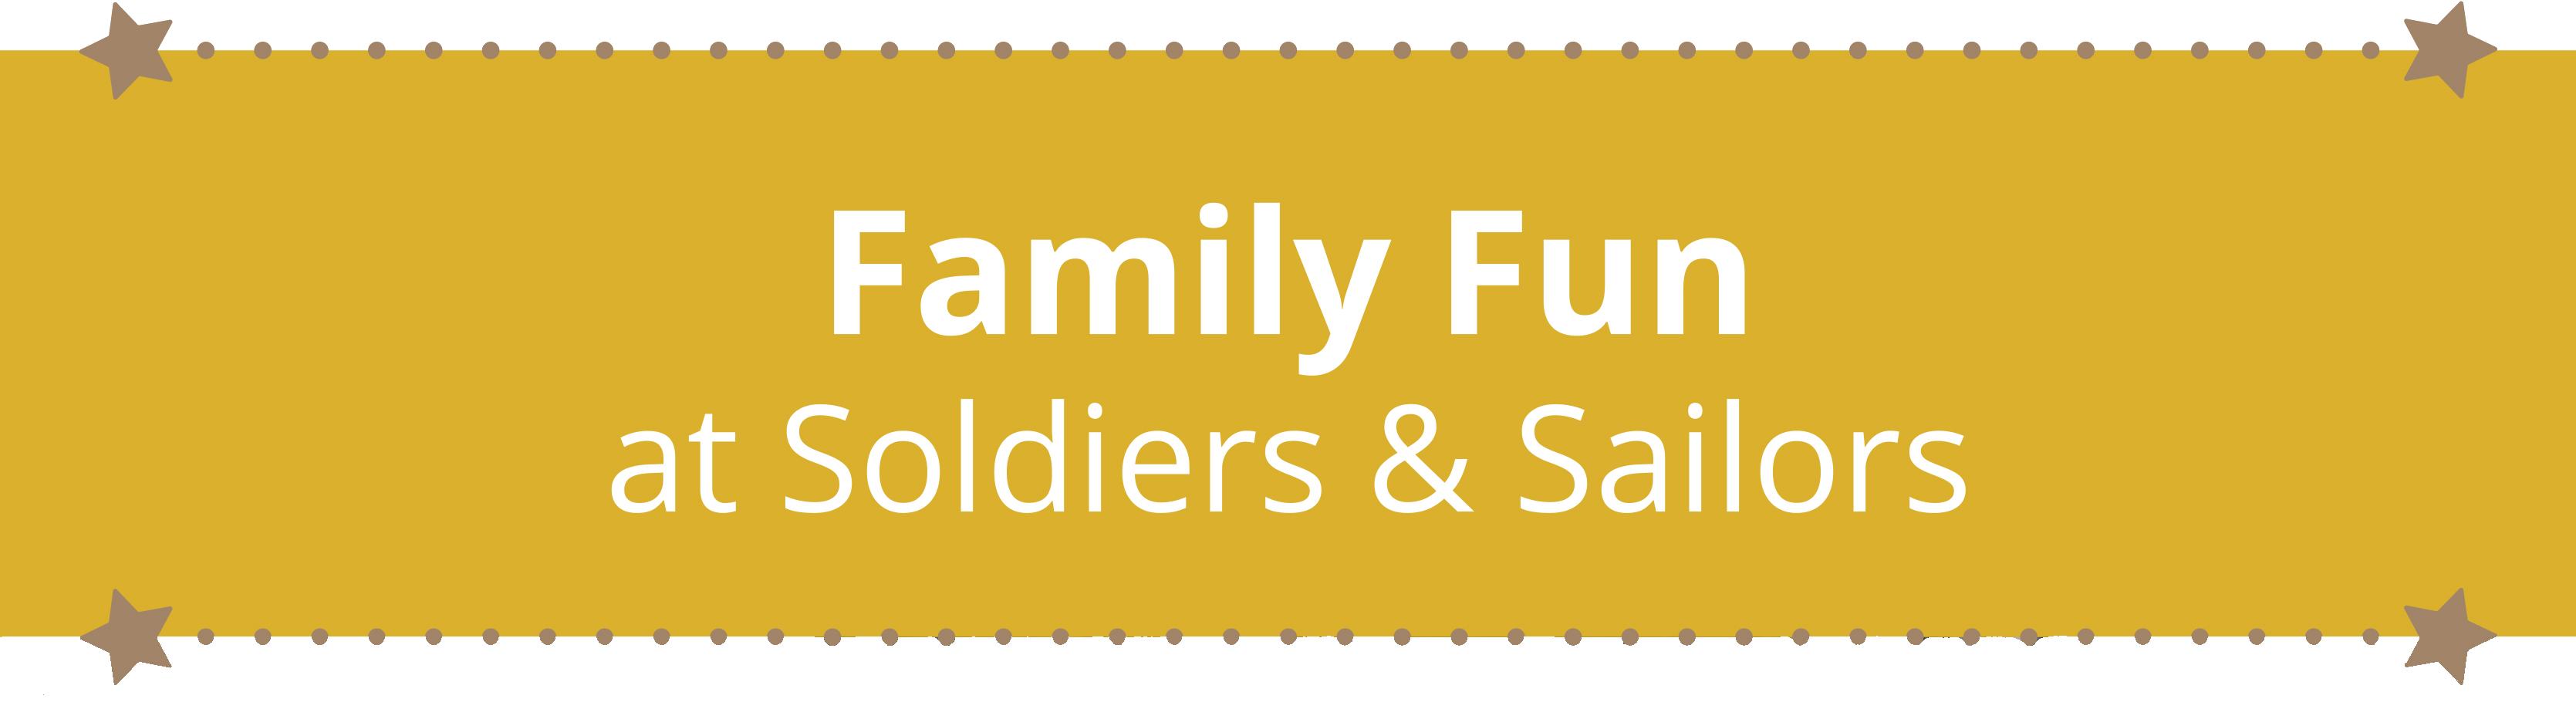 Family Fun Banner Soldiers Sailors Memorial Hall Museum Trust Inc